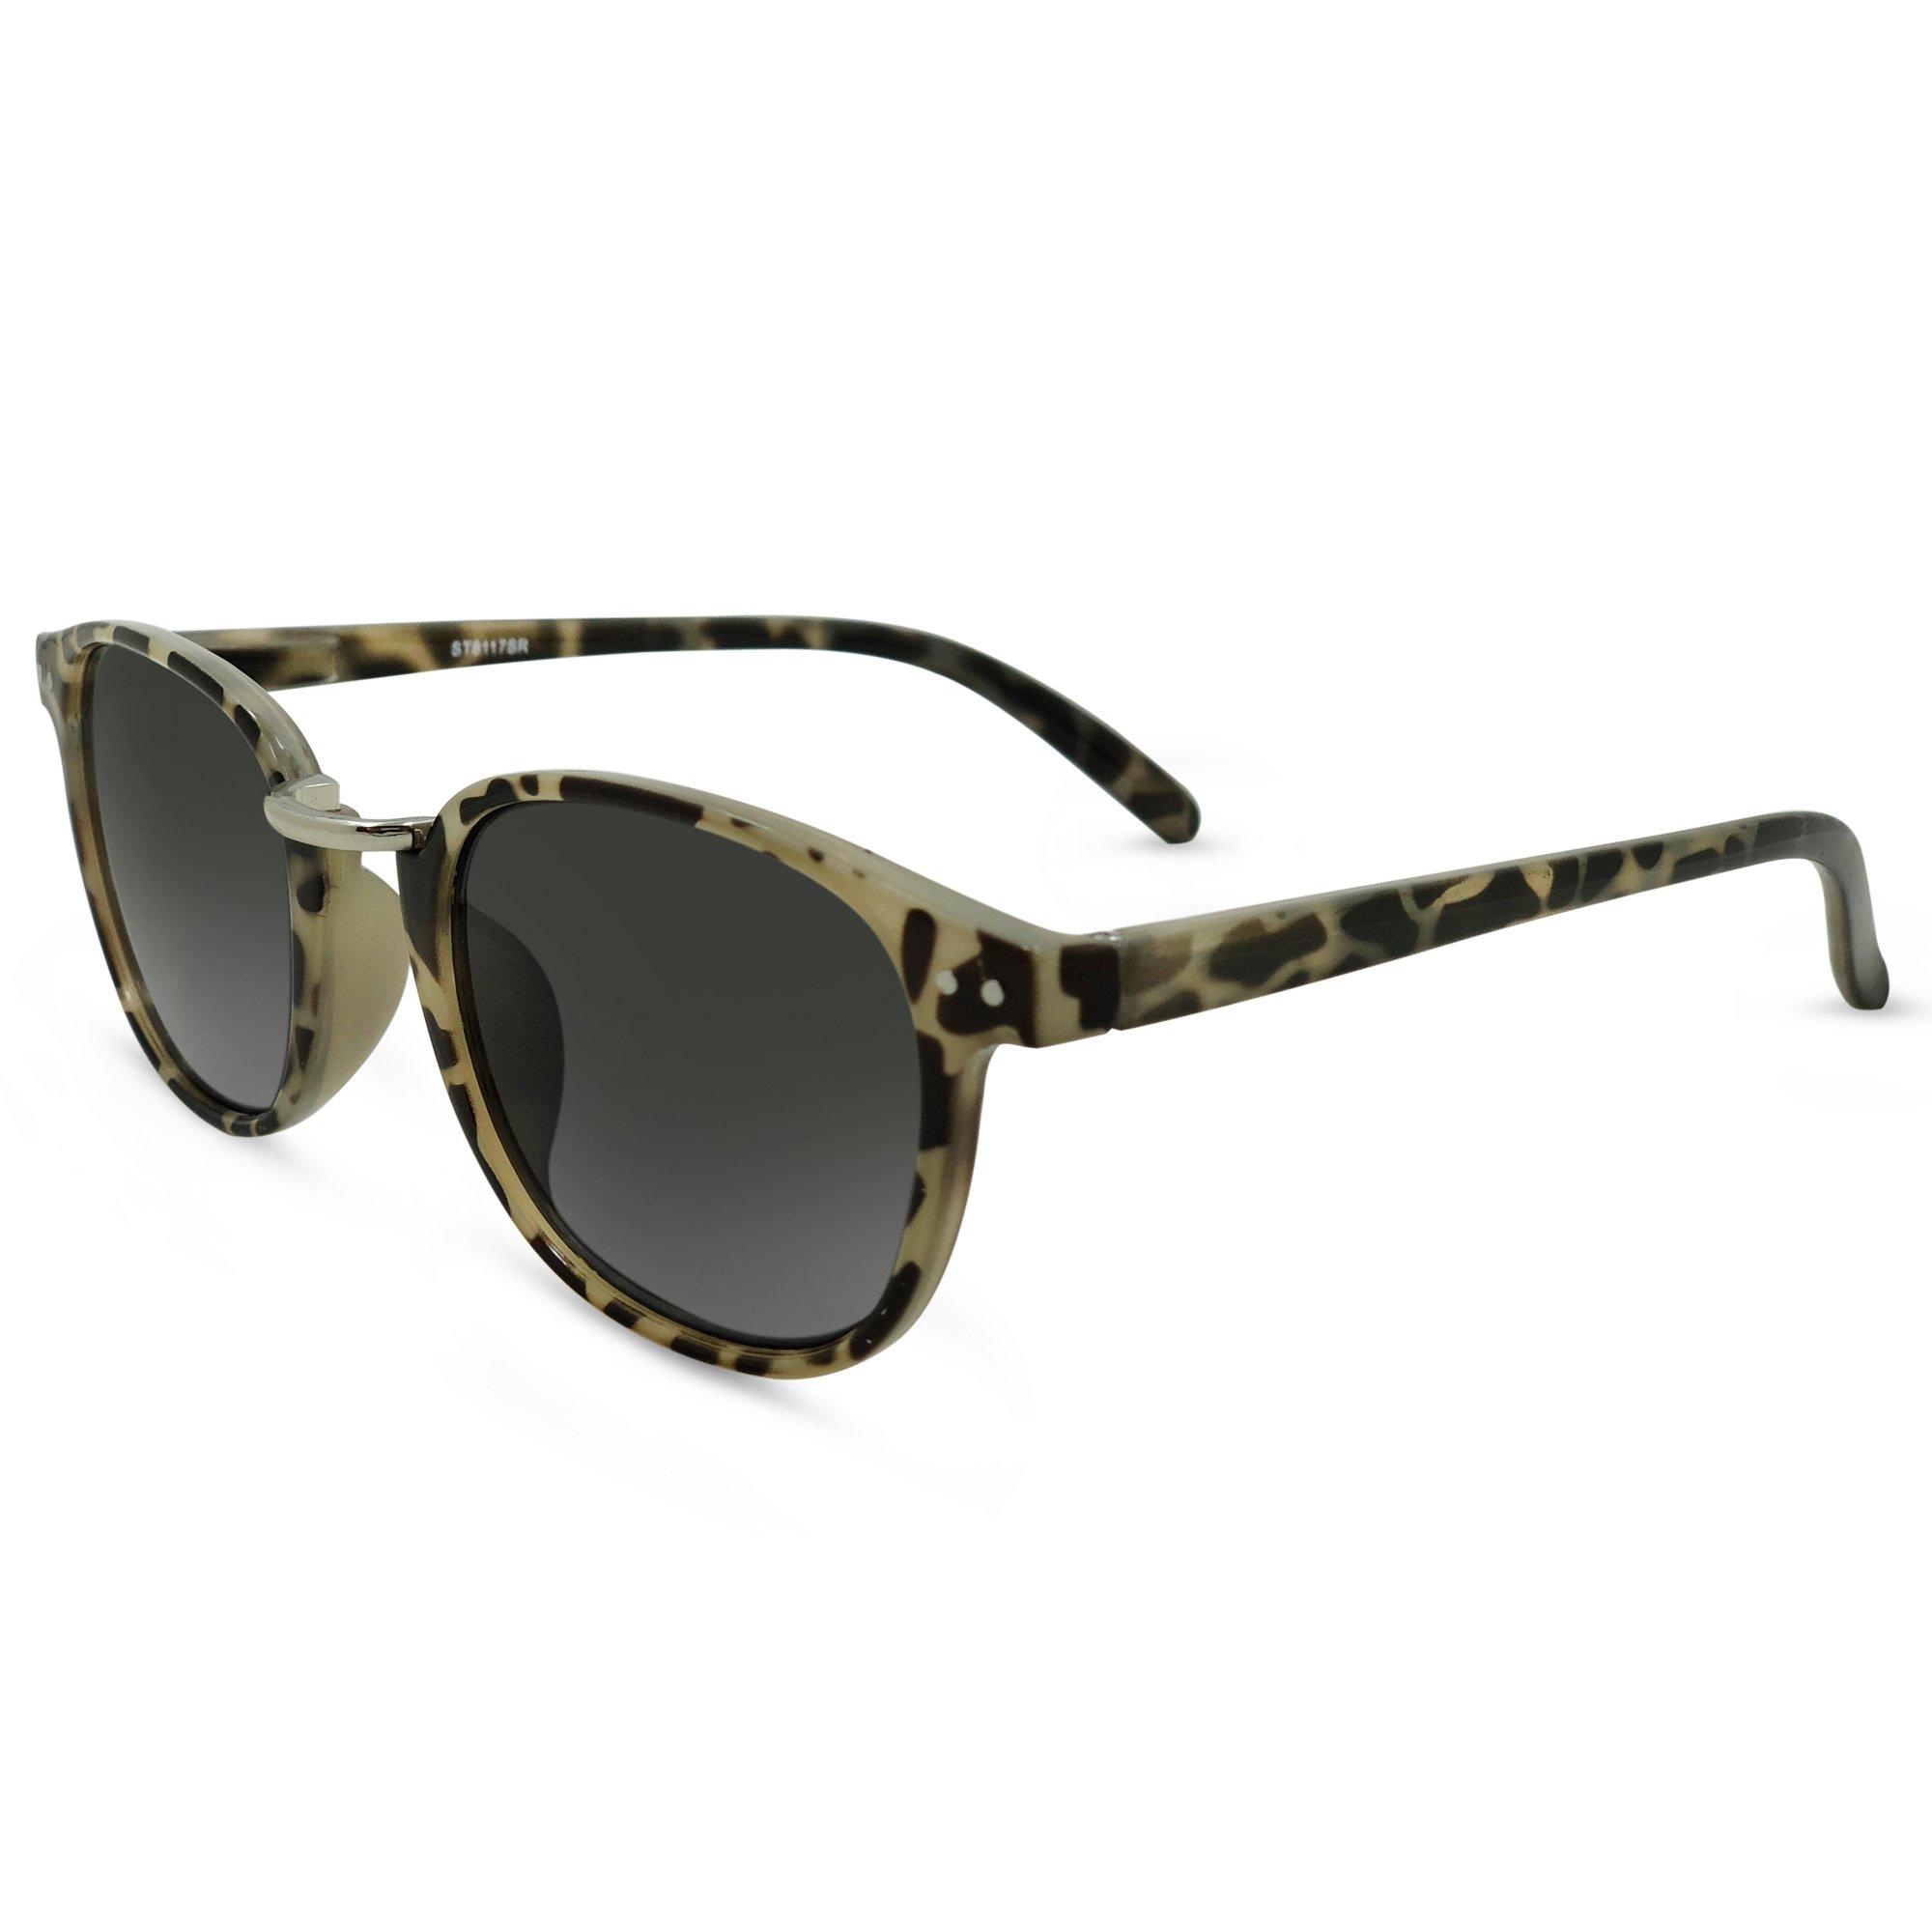 In Style Eyes The Classic Reading Sunglasses, NOT Bifocals Dark Tortoise 1.75